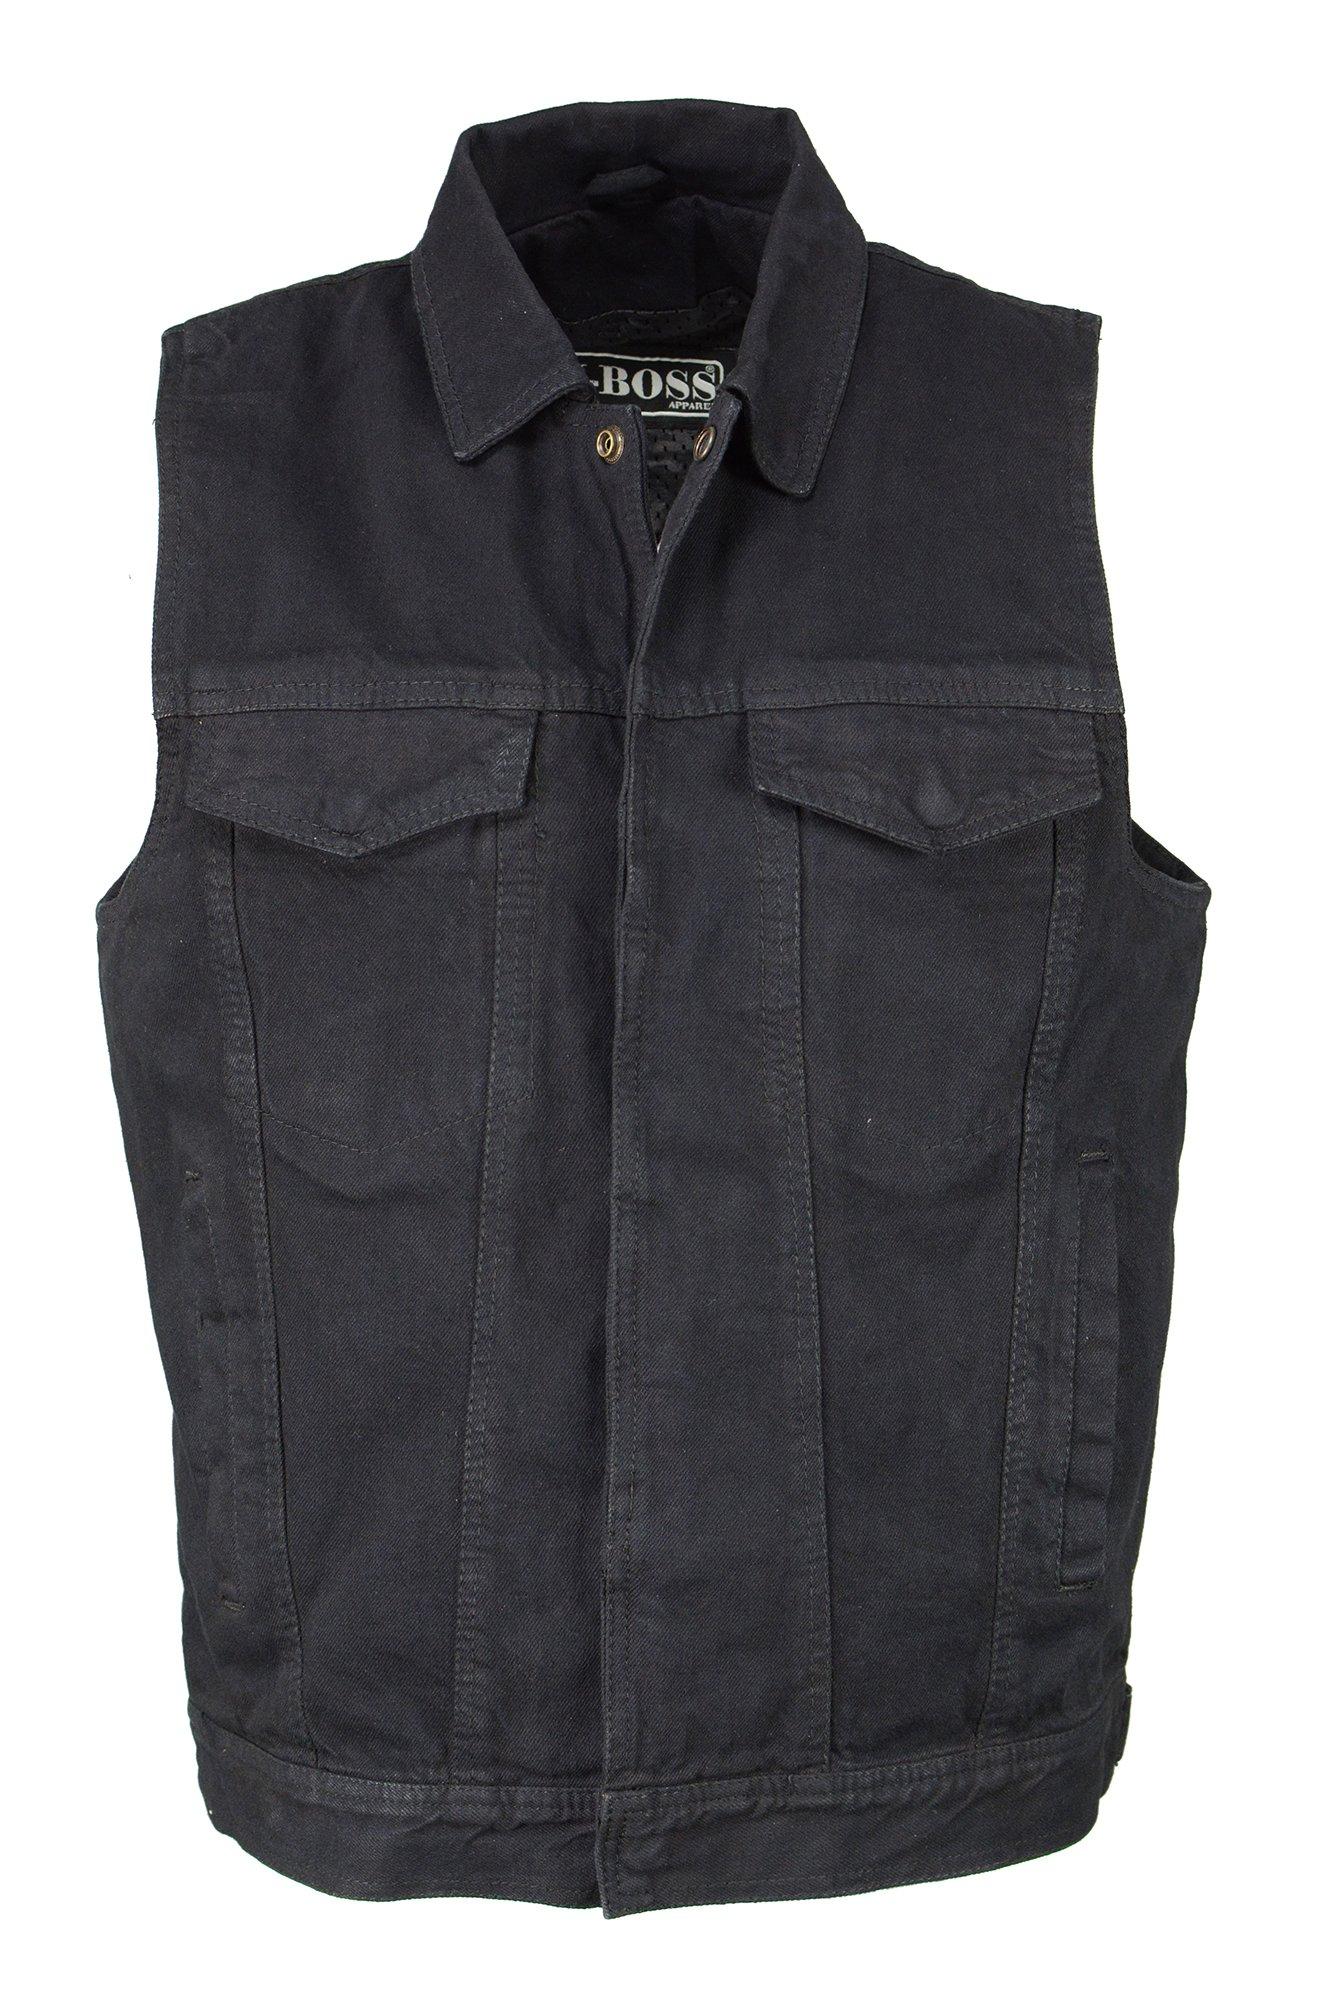 M-Boss Motorcycle Apparel-BOS13004-BLACK-Men's Denim Snap Front Vest w/Shirt Collar-BLACK-2XL